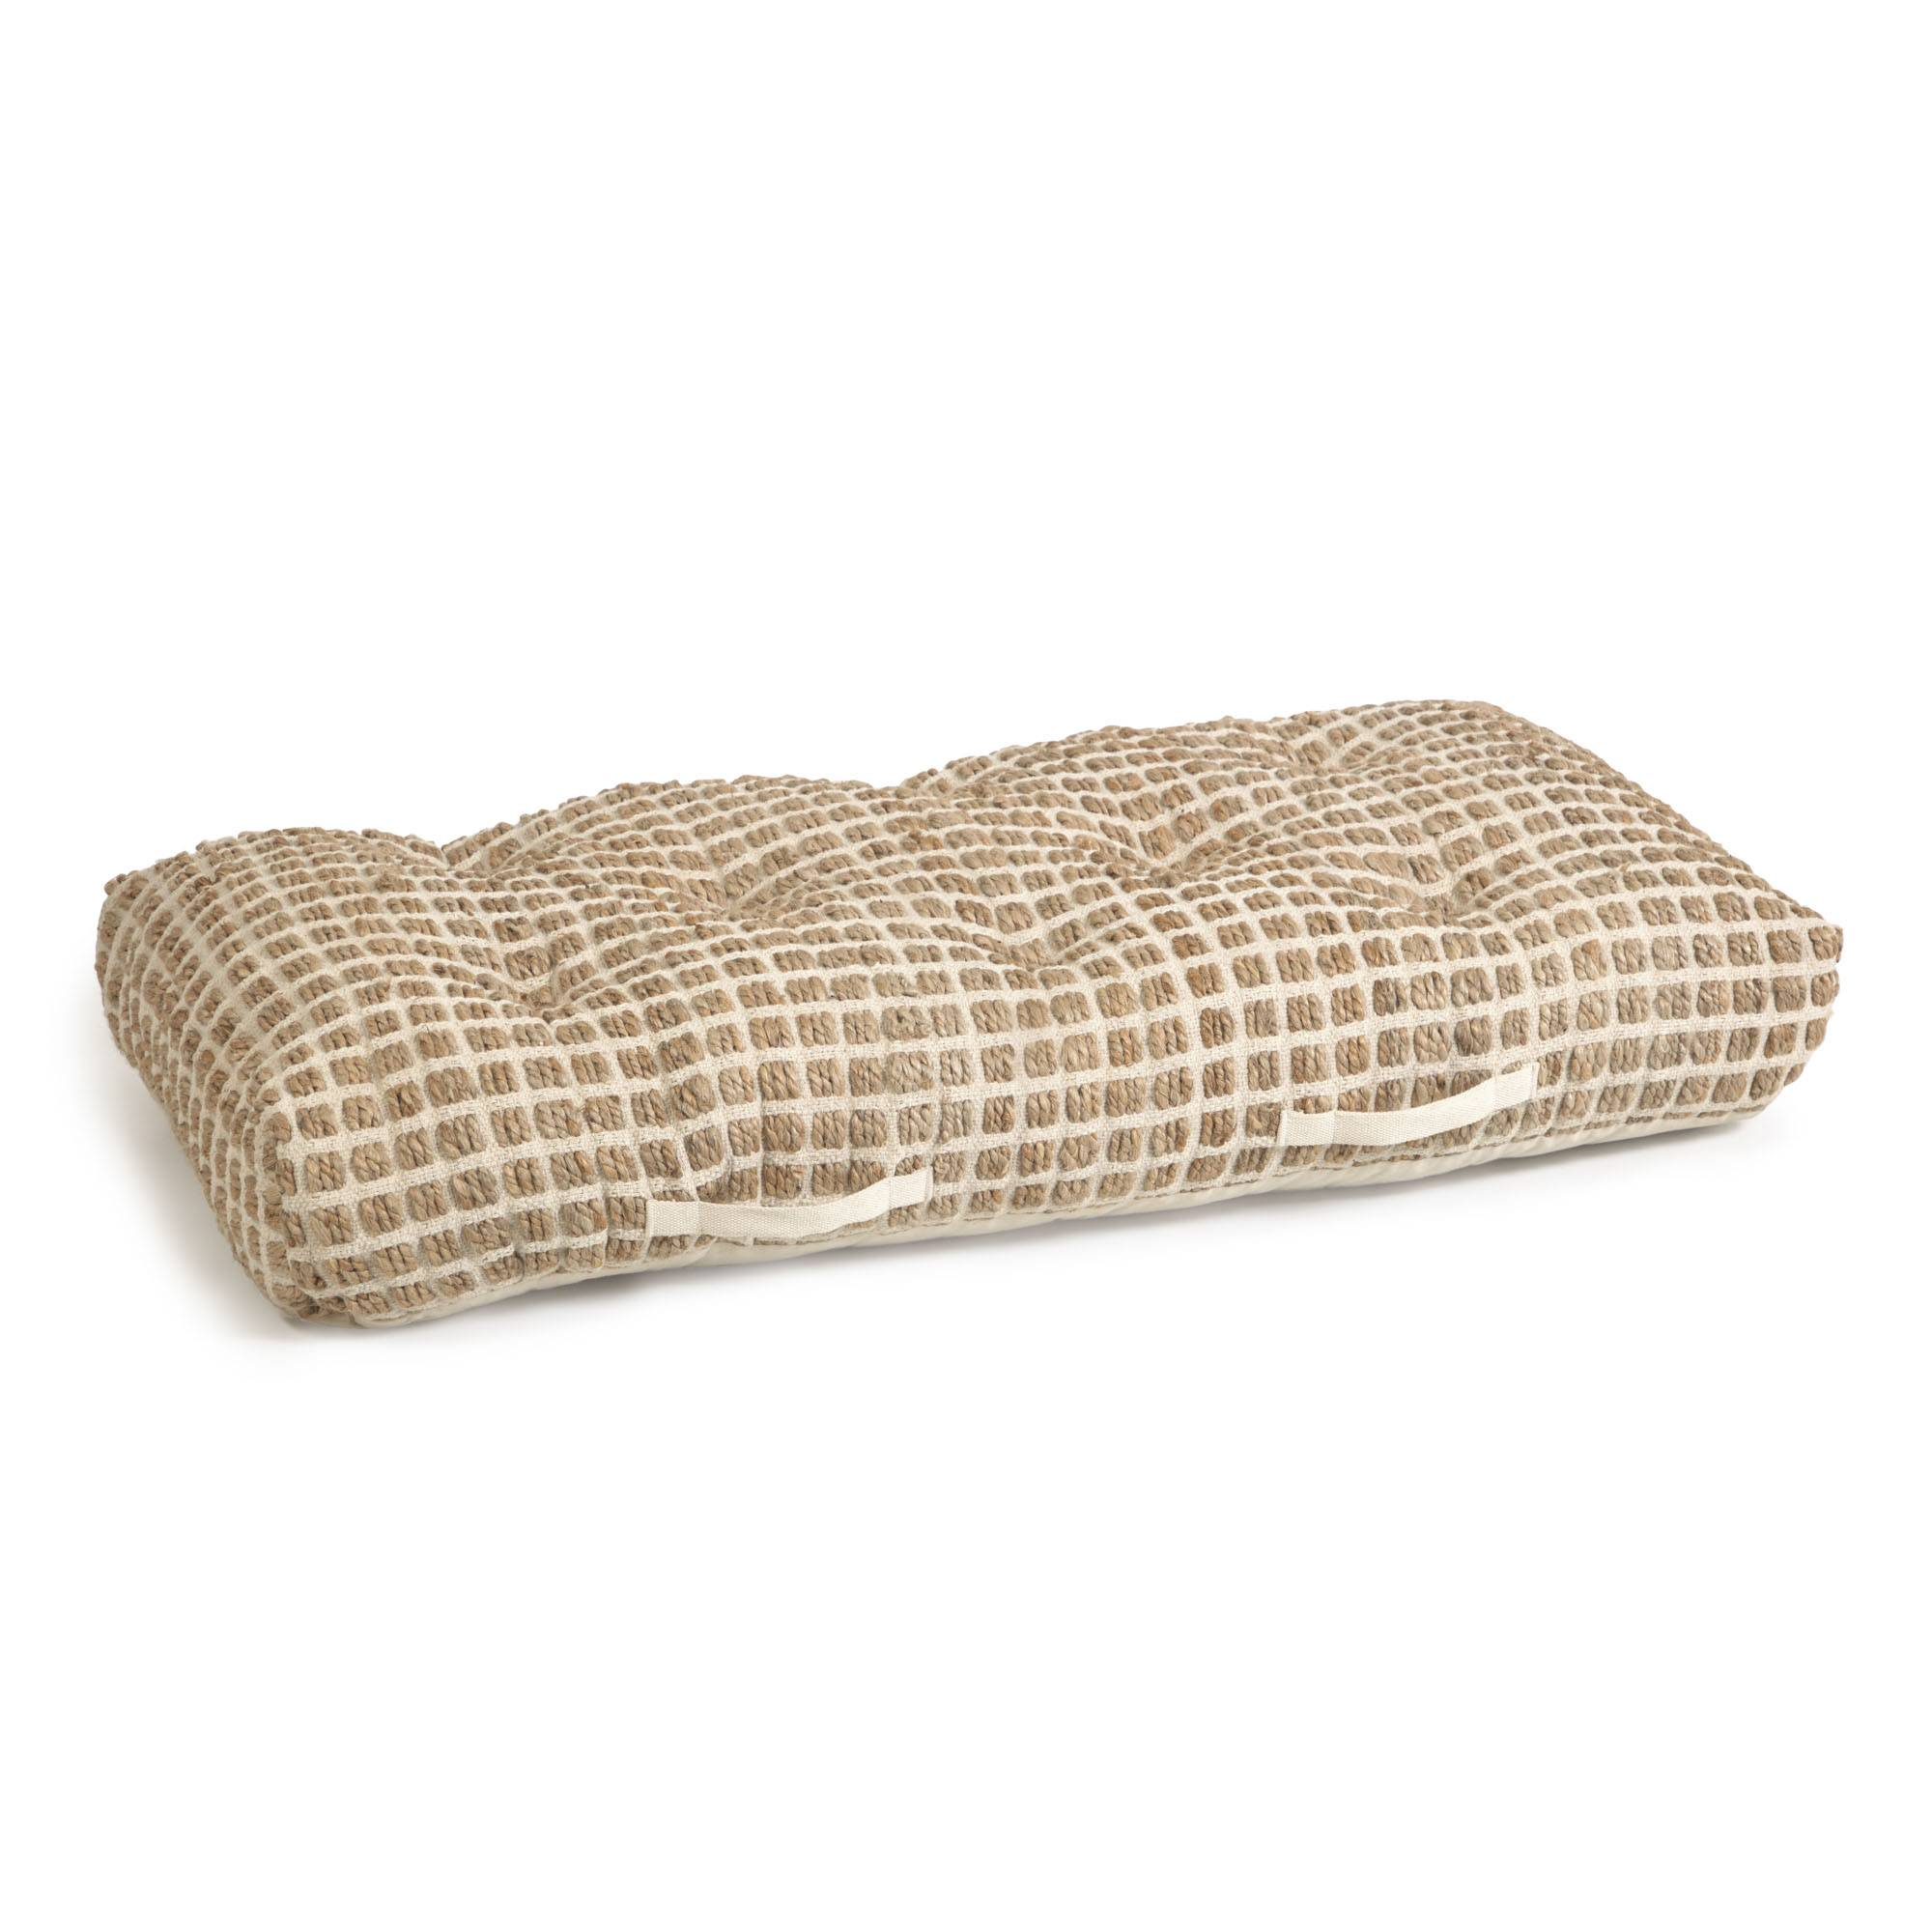 Kave Home Cuscino da terra o per pallet Adelma iuta e cotone bianco e naturale 60 x 120 cm